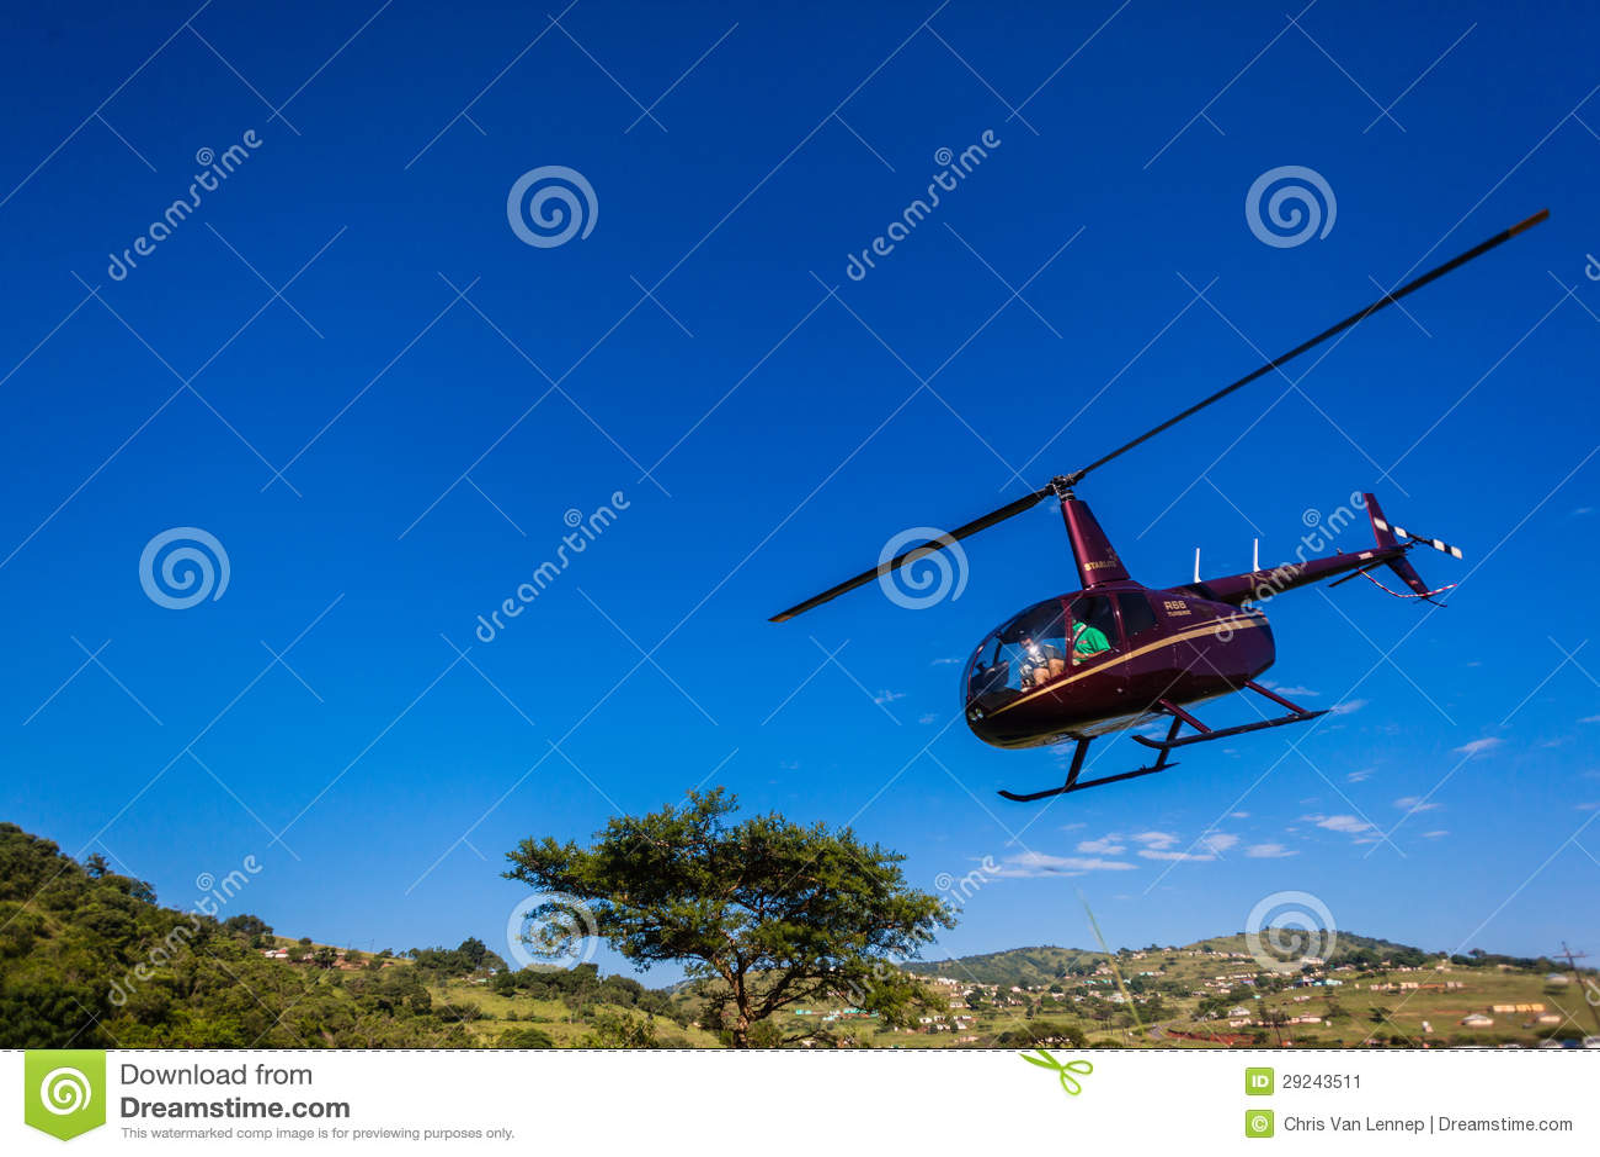 Download Azul Da Cobertura Do Evento Do Helicóptero Foto Editorial - Imagem de helicóptero, habilidade: 29243511